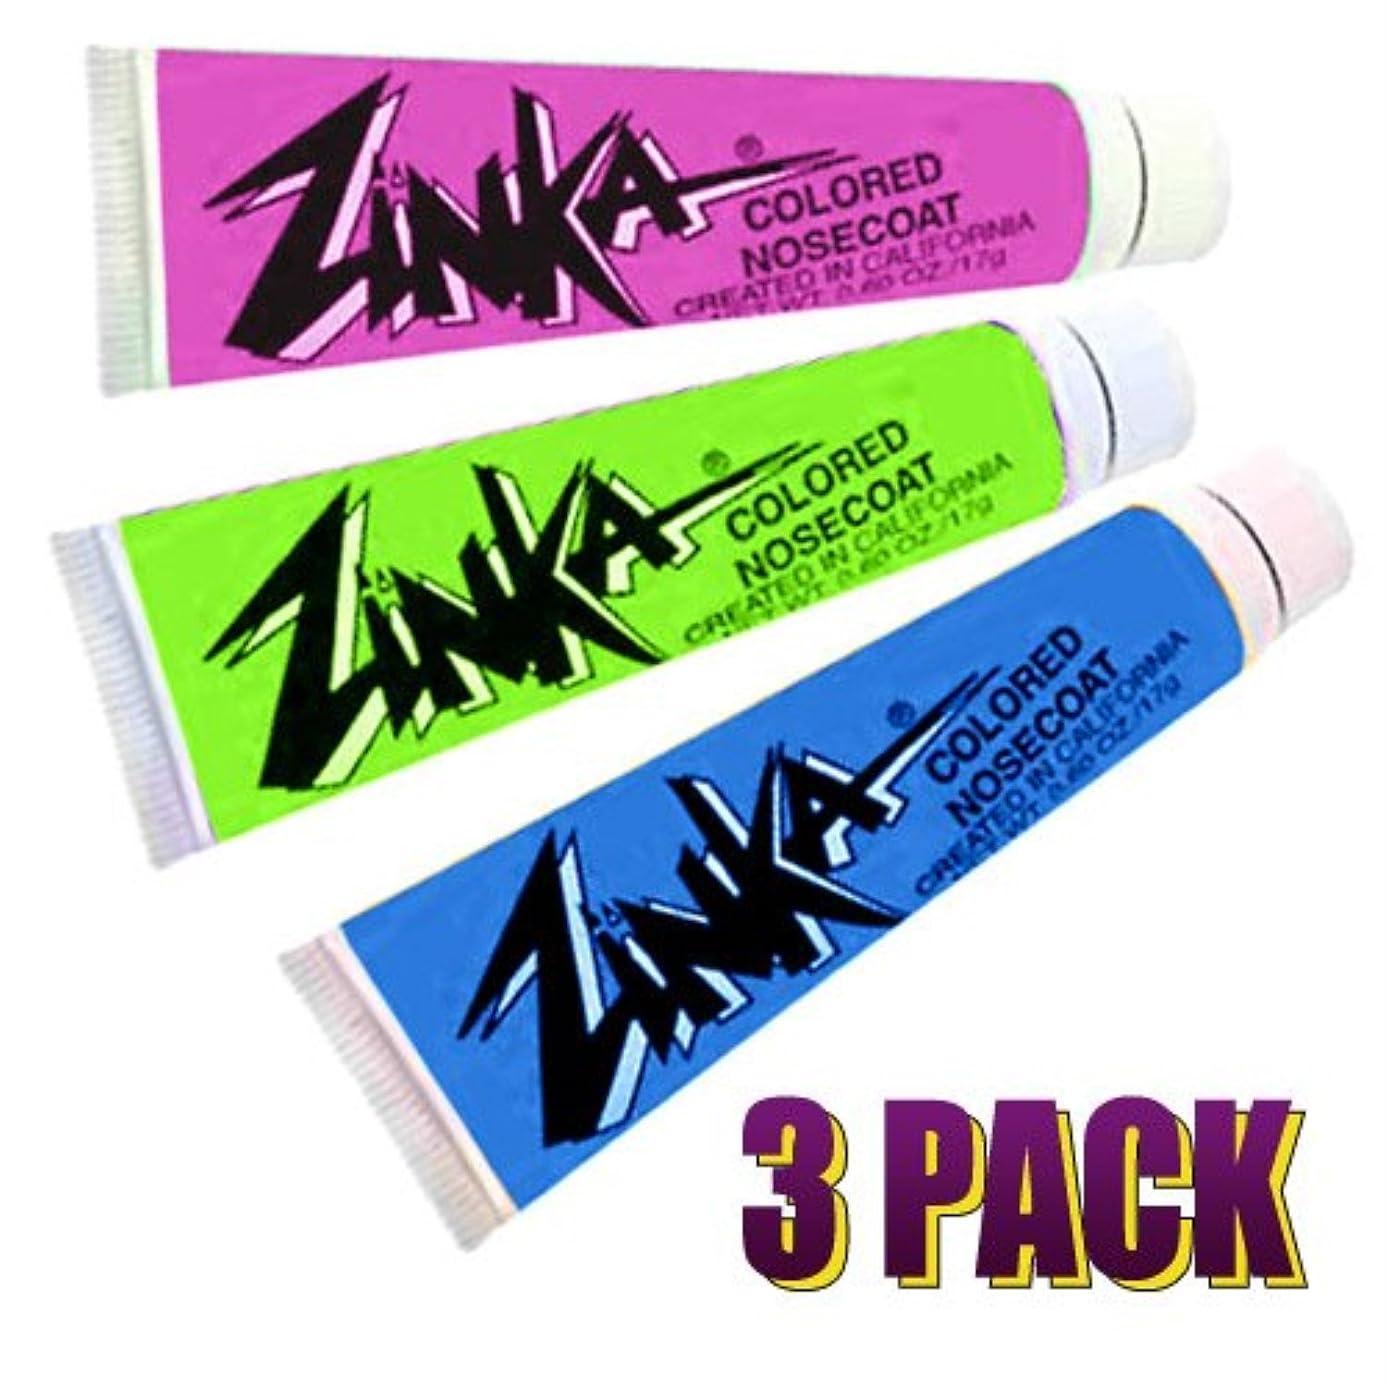 Zinka Colored Sunblock Zinc Waterproof Nosecoat 3 Pack Bundle .6oz Tube - Blue Pink Green utck7475695